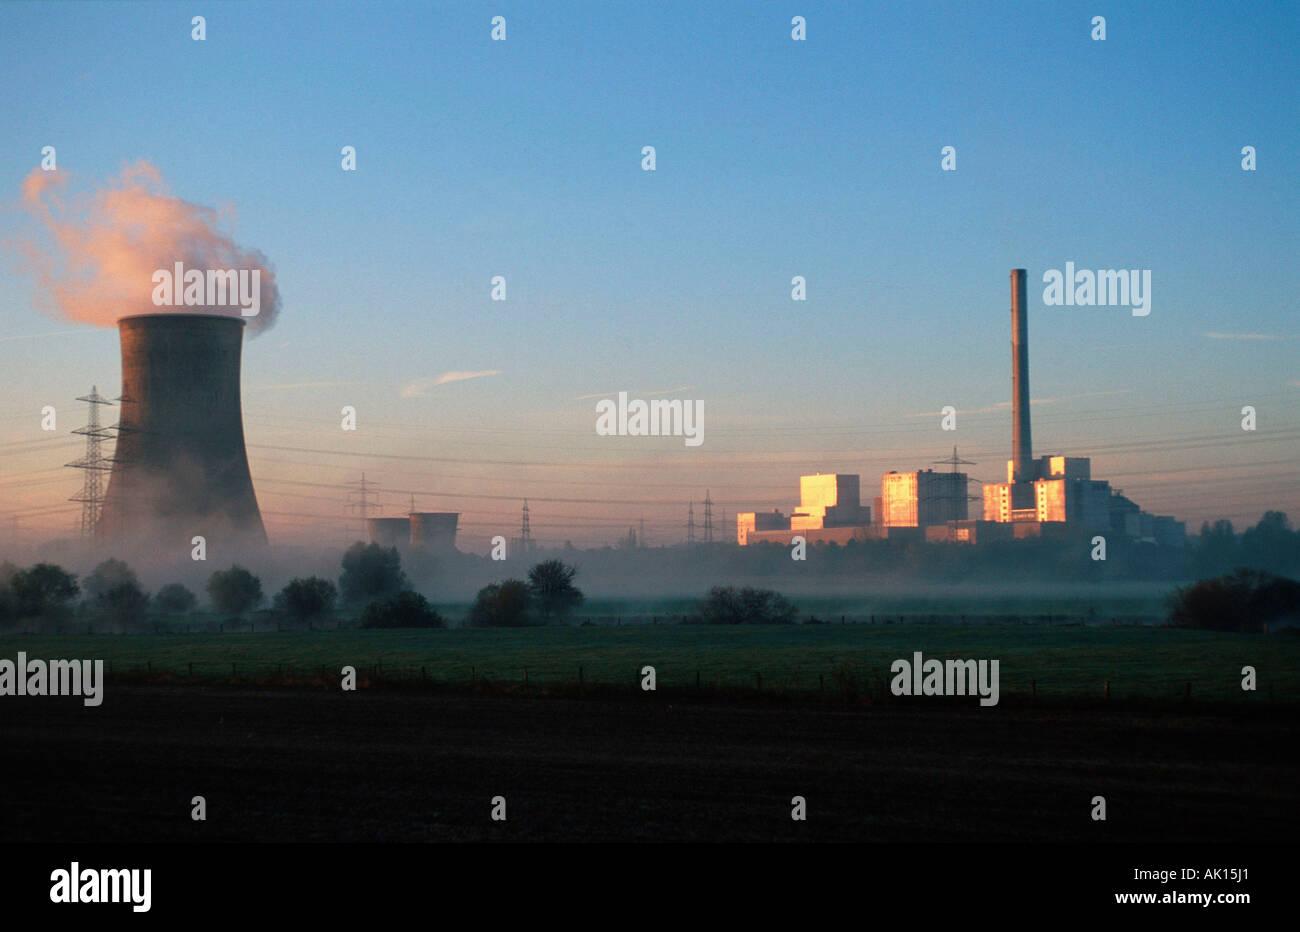 Nuclear Power Station / Hamm-Uentrop / Atomkraftwerk - Stock Image